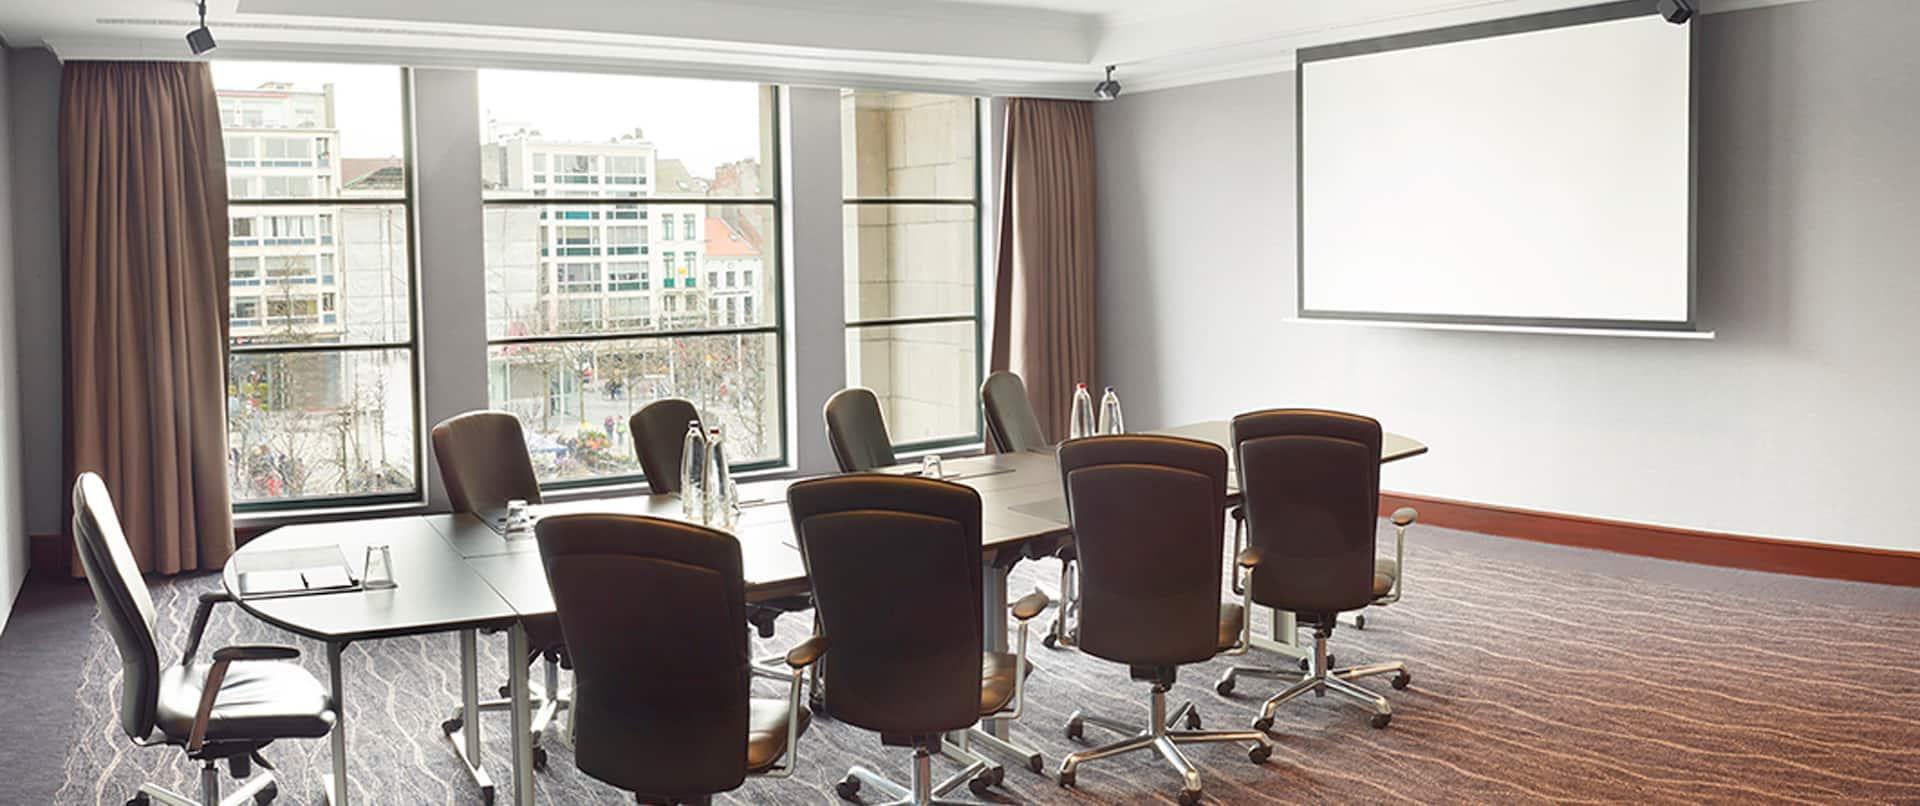 Shah Meeting Room